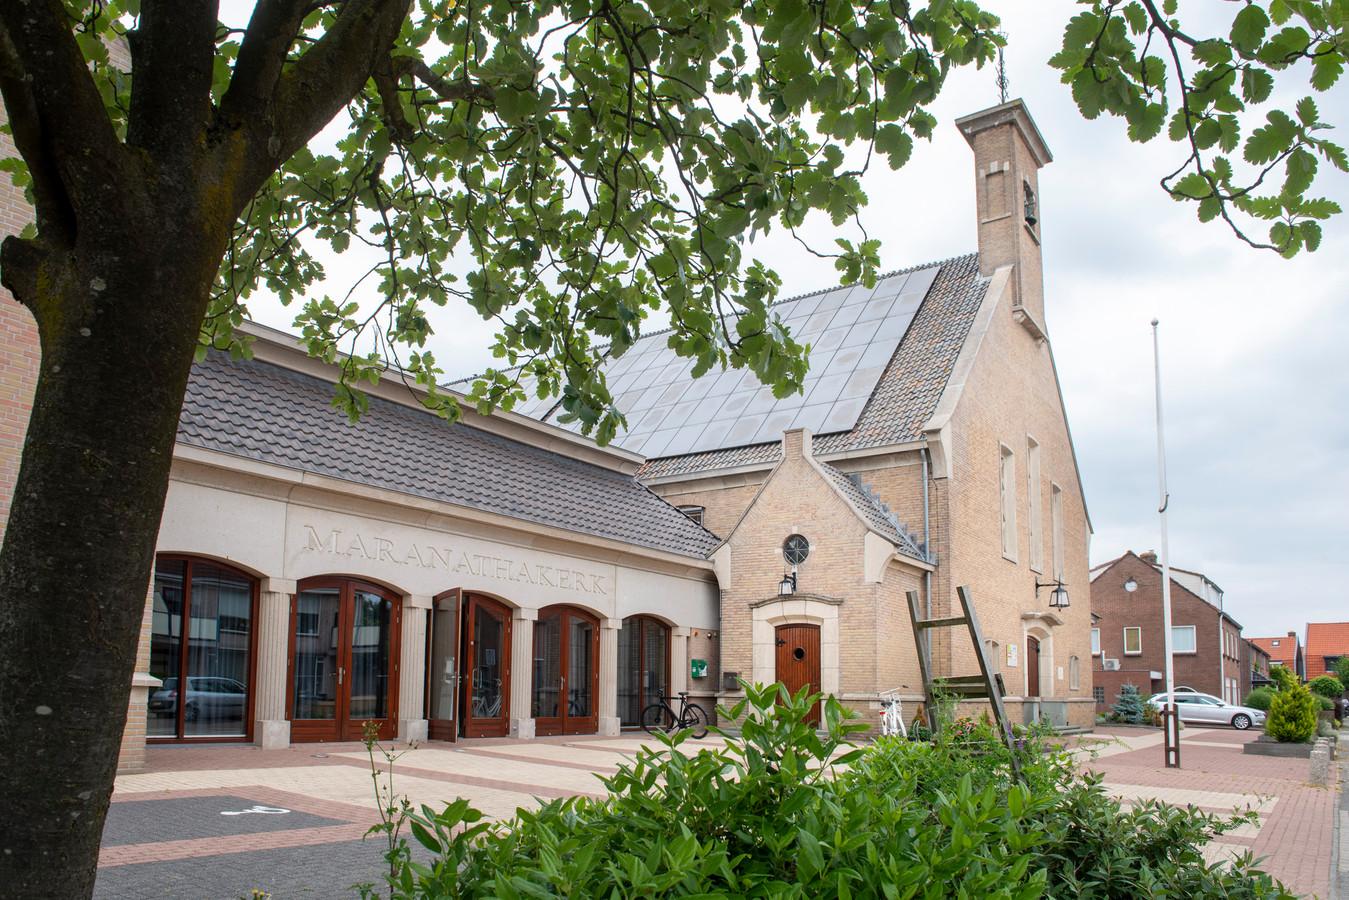 Maranathakerk in Bunschoten.